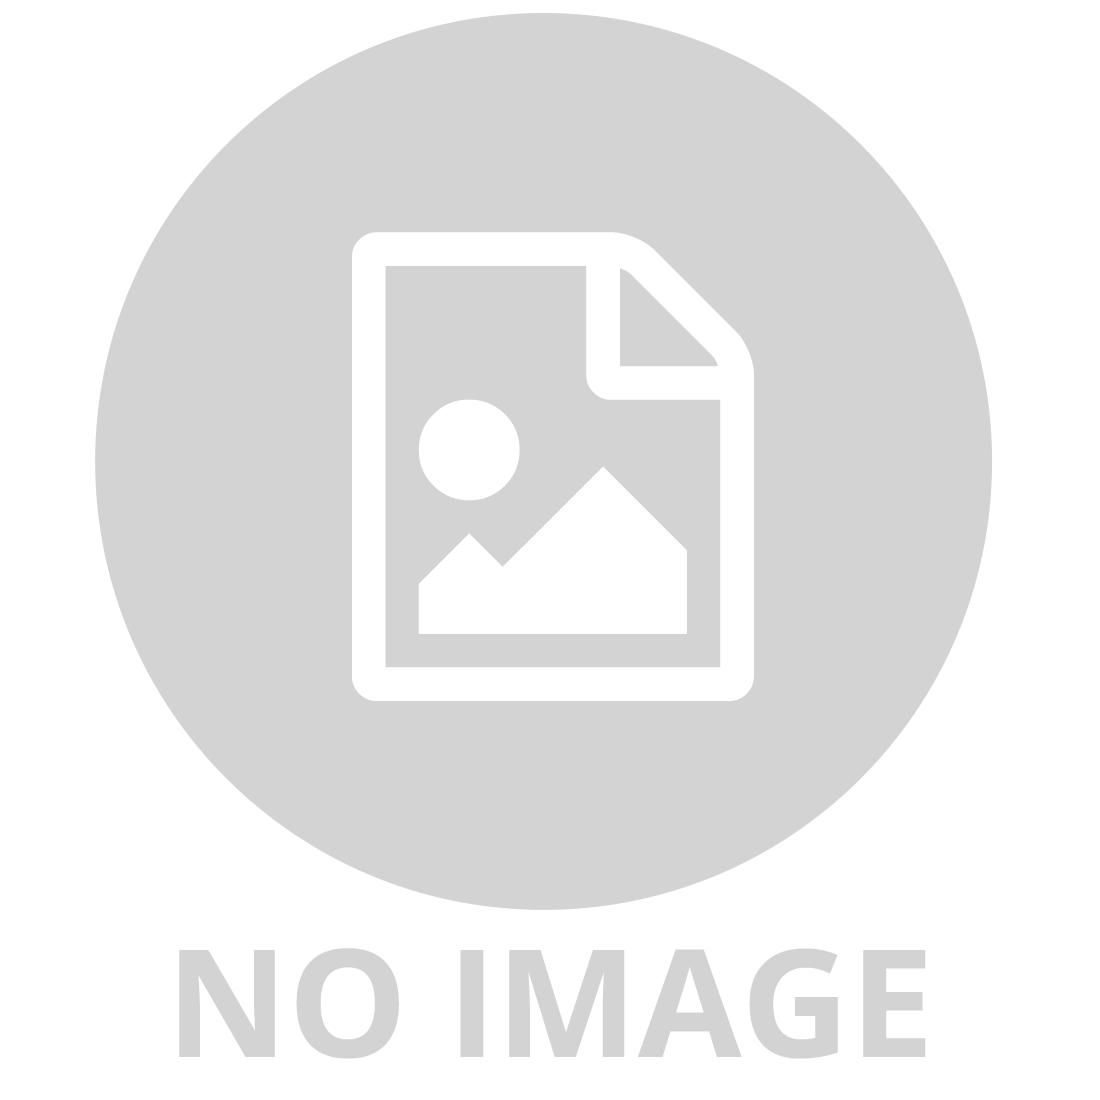 LEGO MARVEL 76134 SPIDER-MAN DOC OCK DIAMOND HEIST